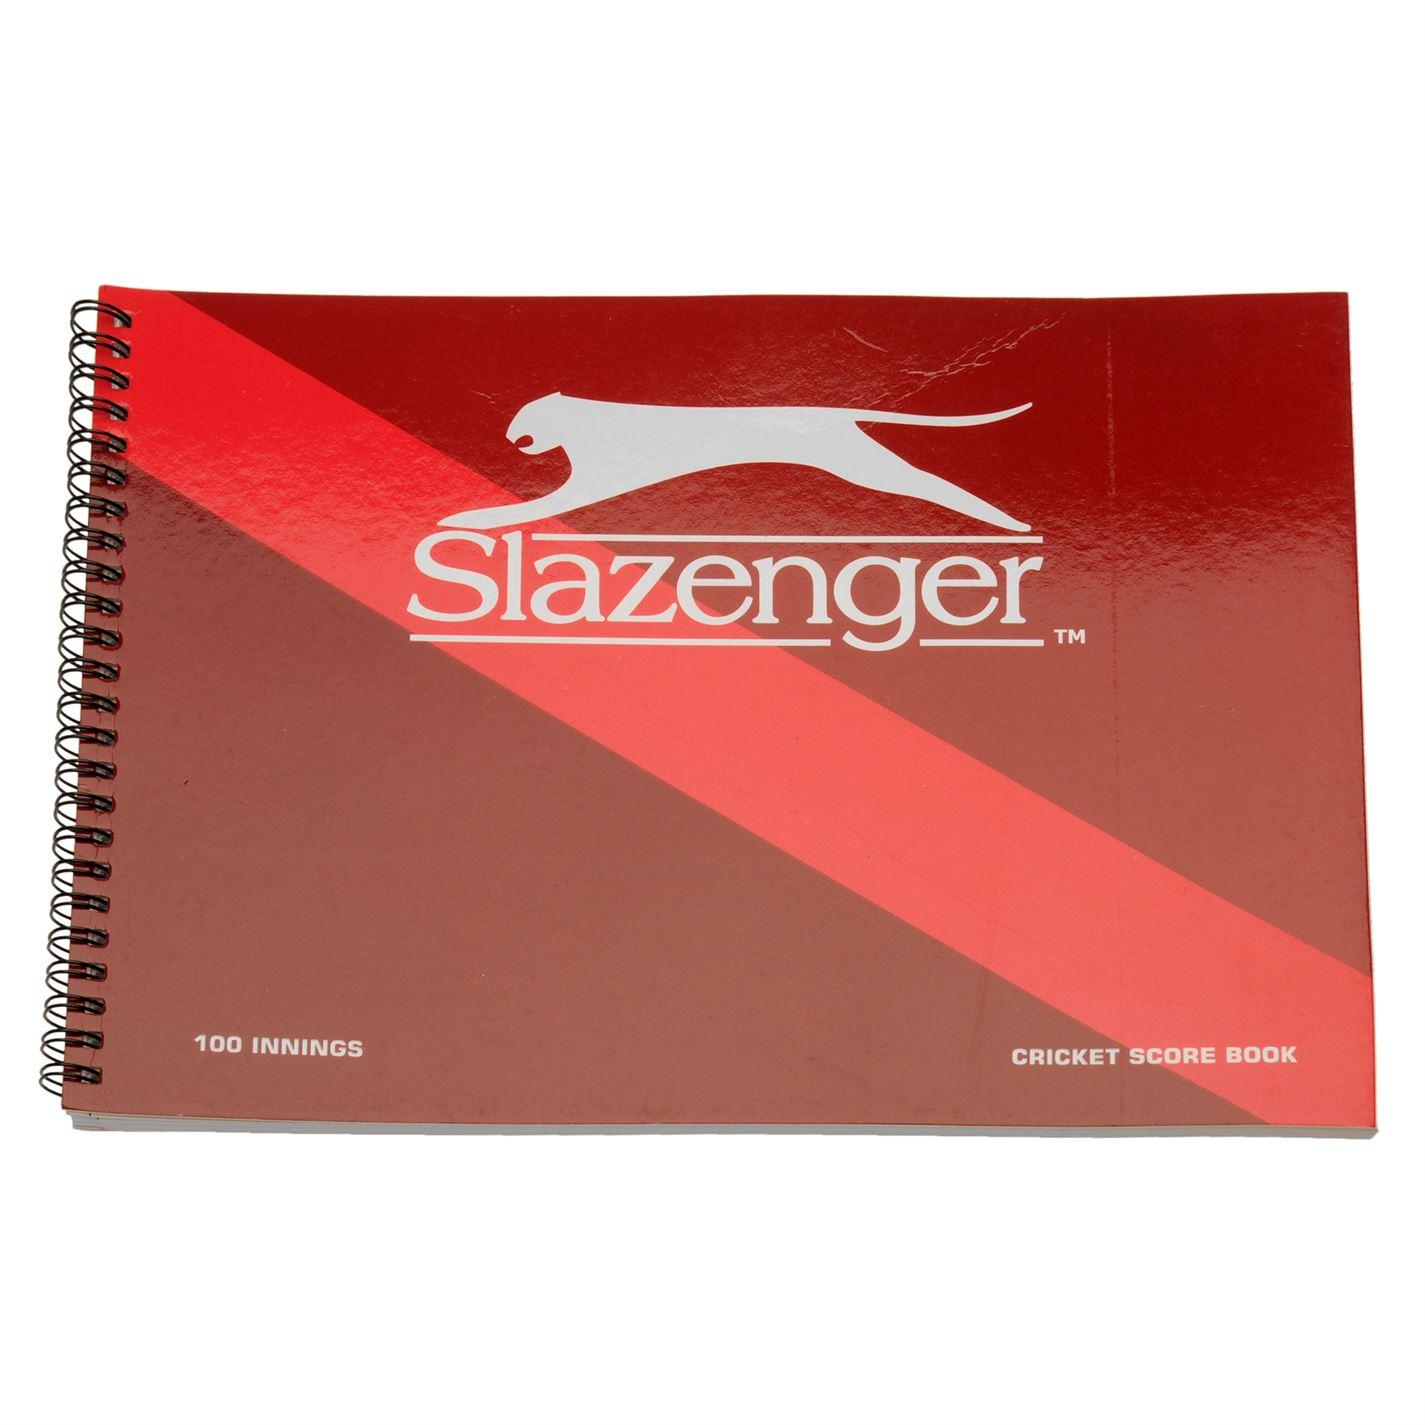 Slazenger Cricket Scorebook